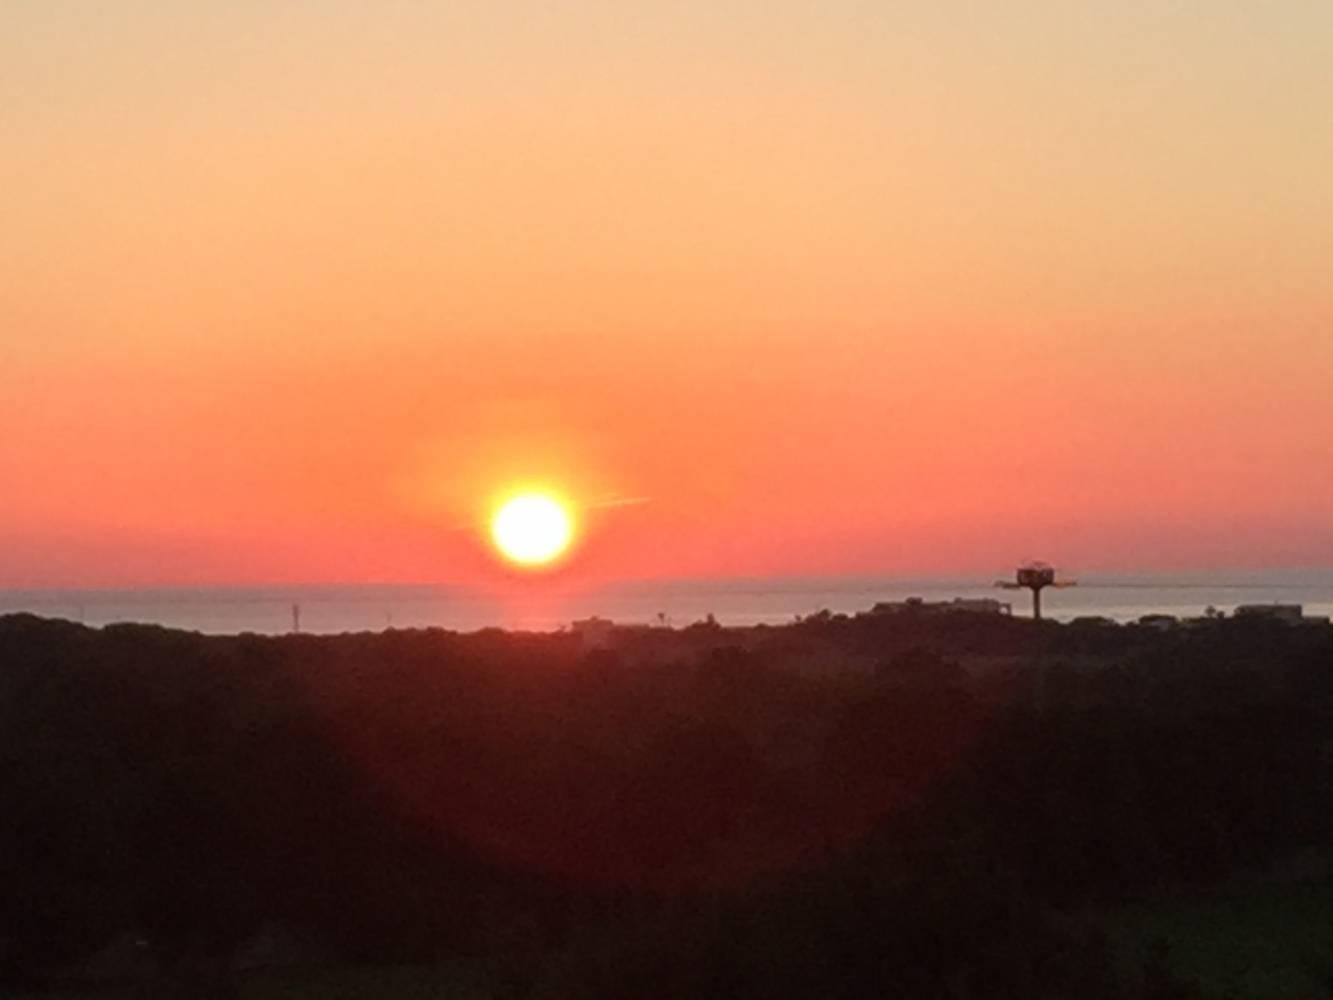 15-Sunset-3-14.10.56